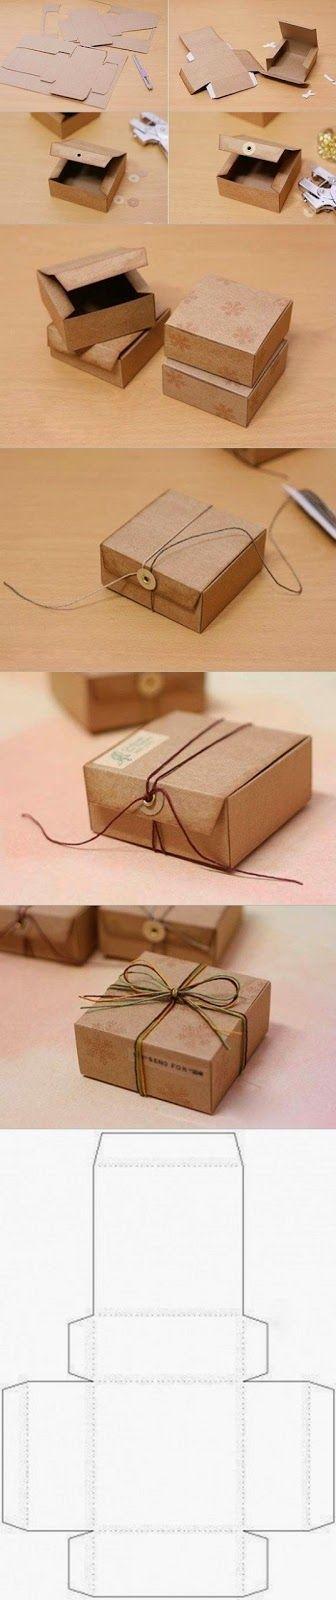 DIY : Gift Box from Cardboard